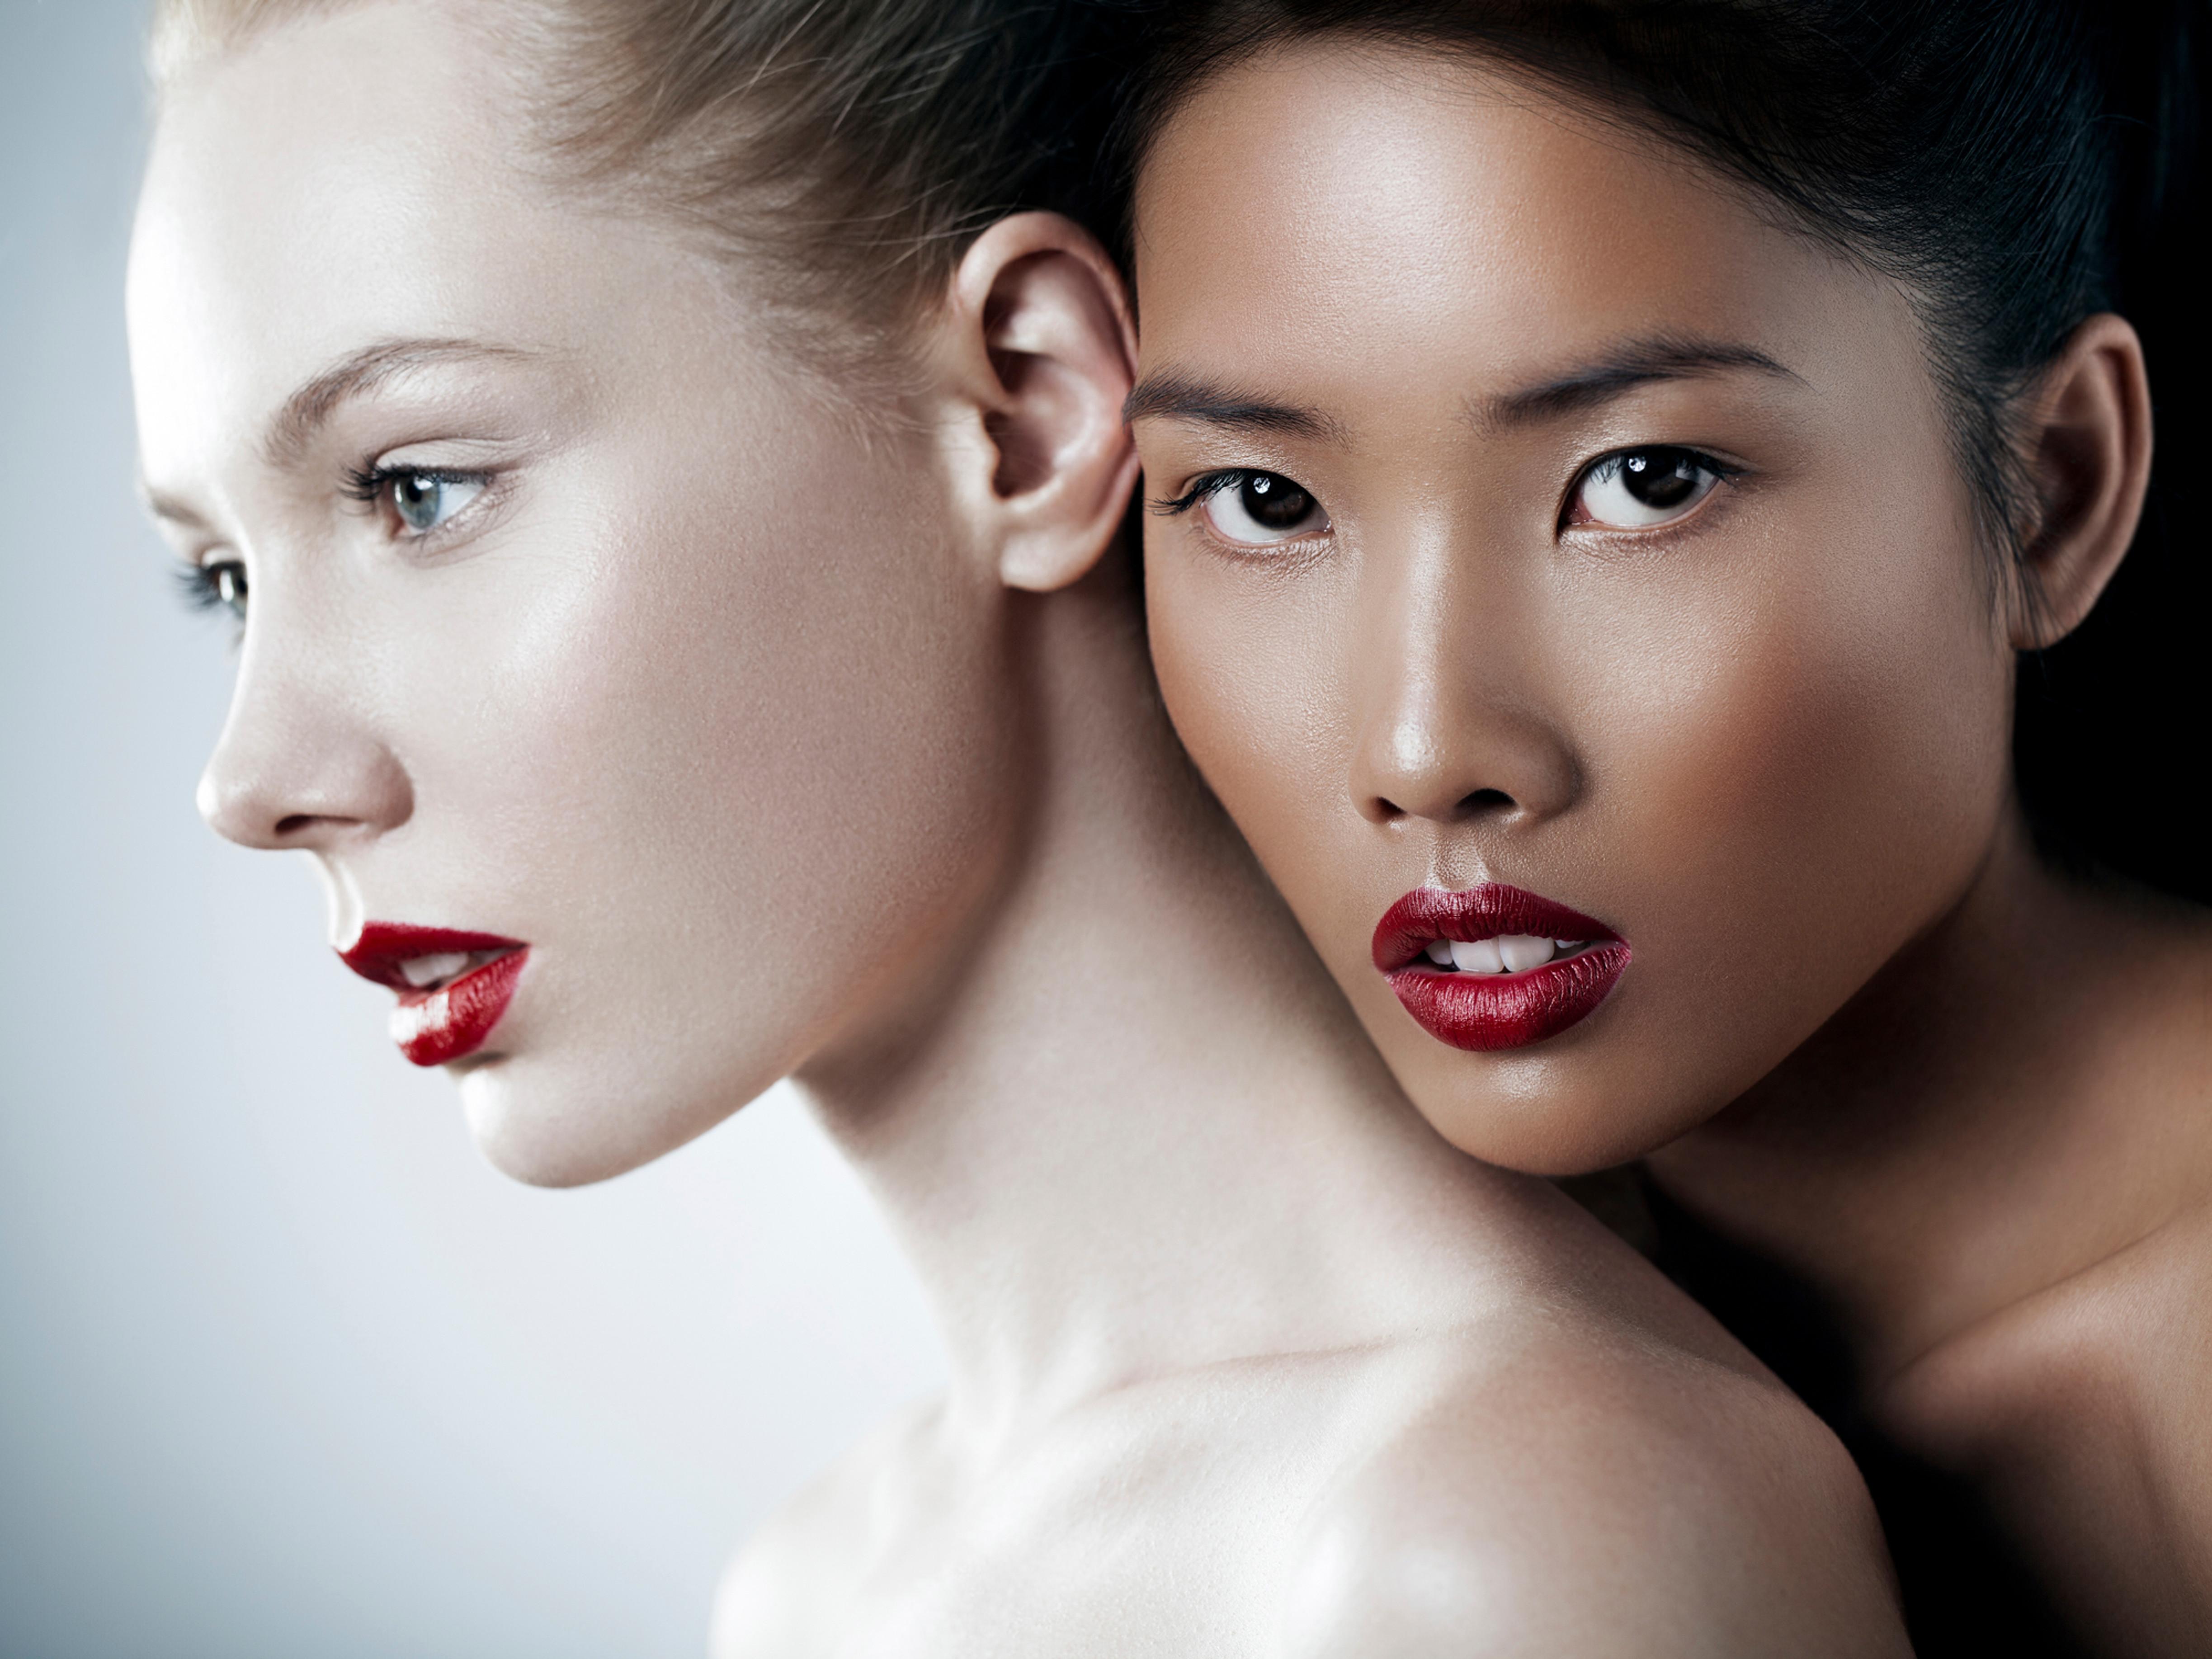 Life Coaching Through Fashion and Beauty